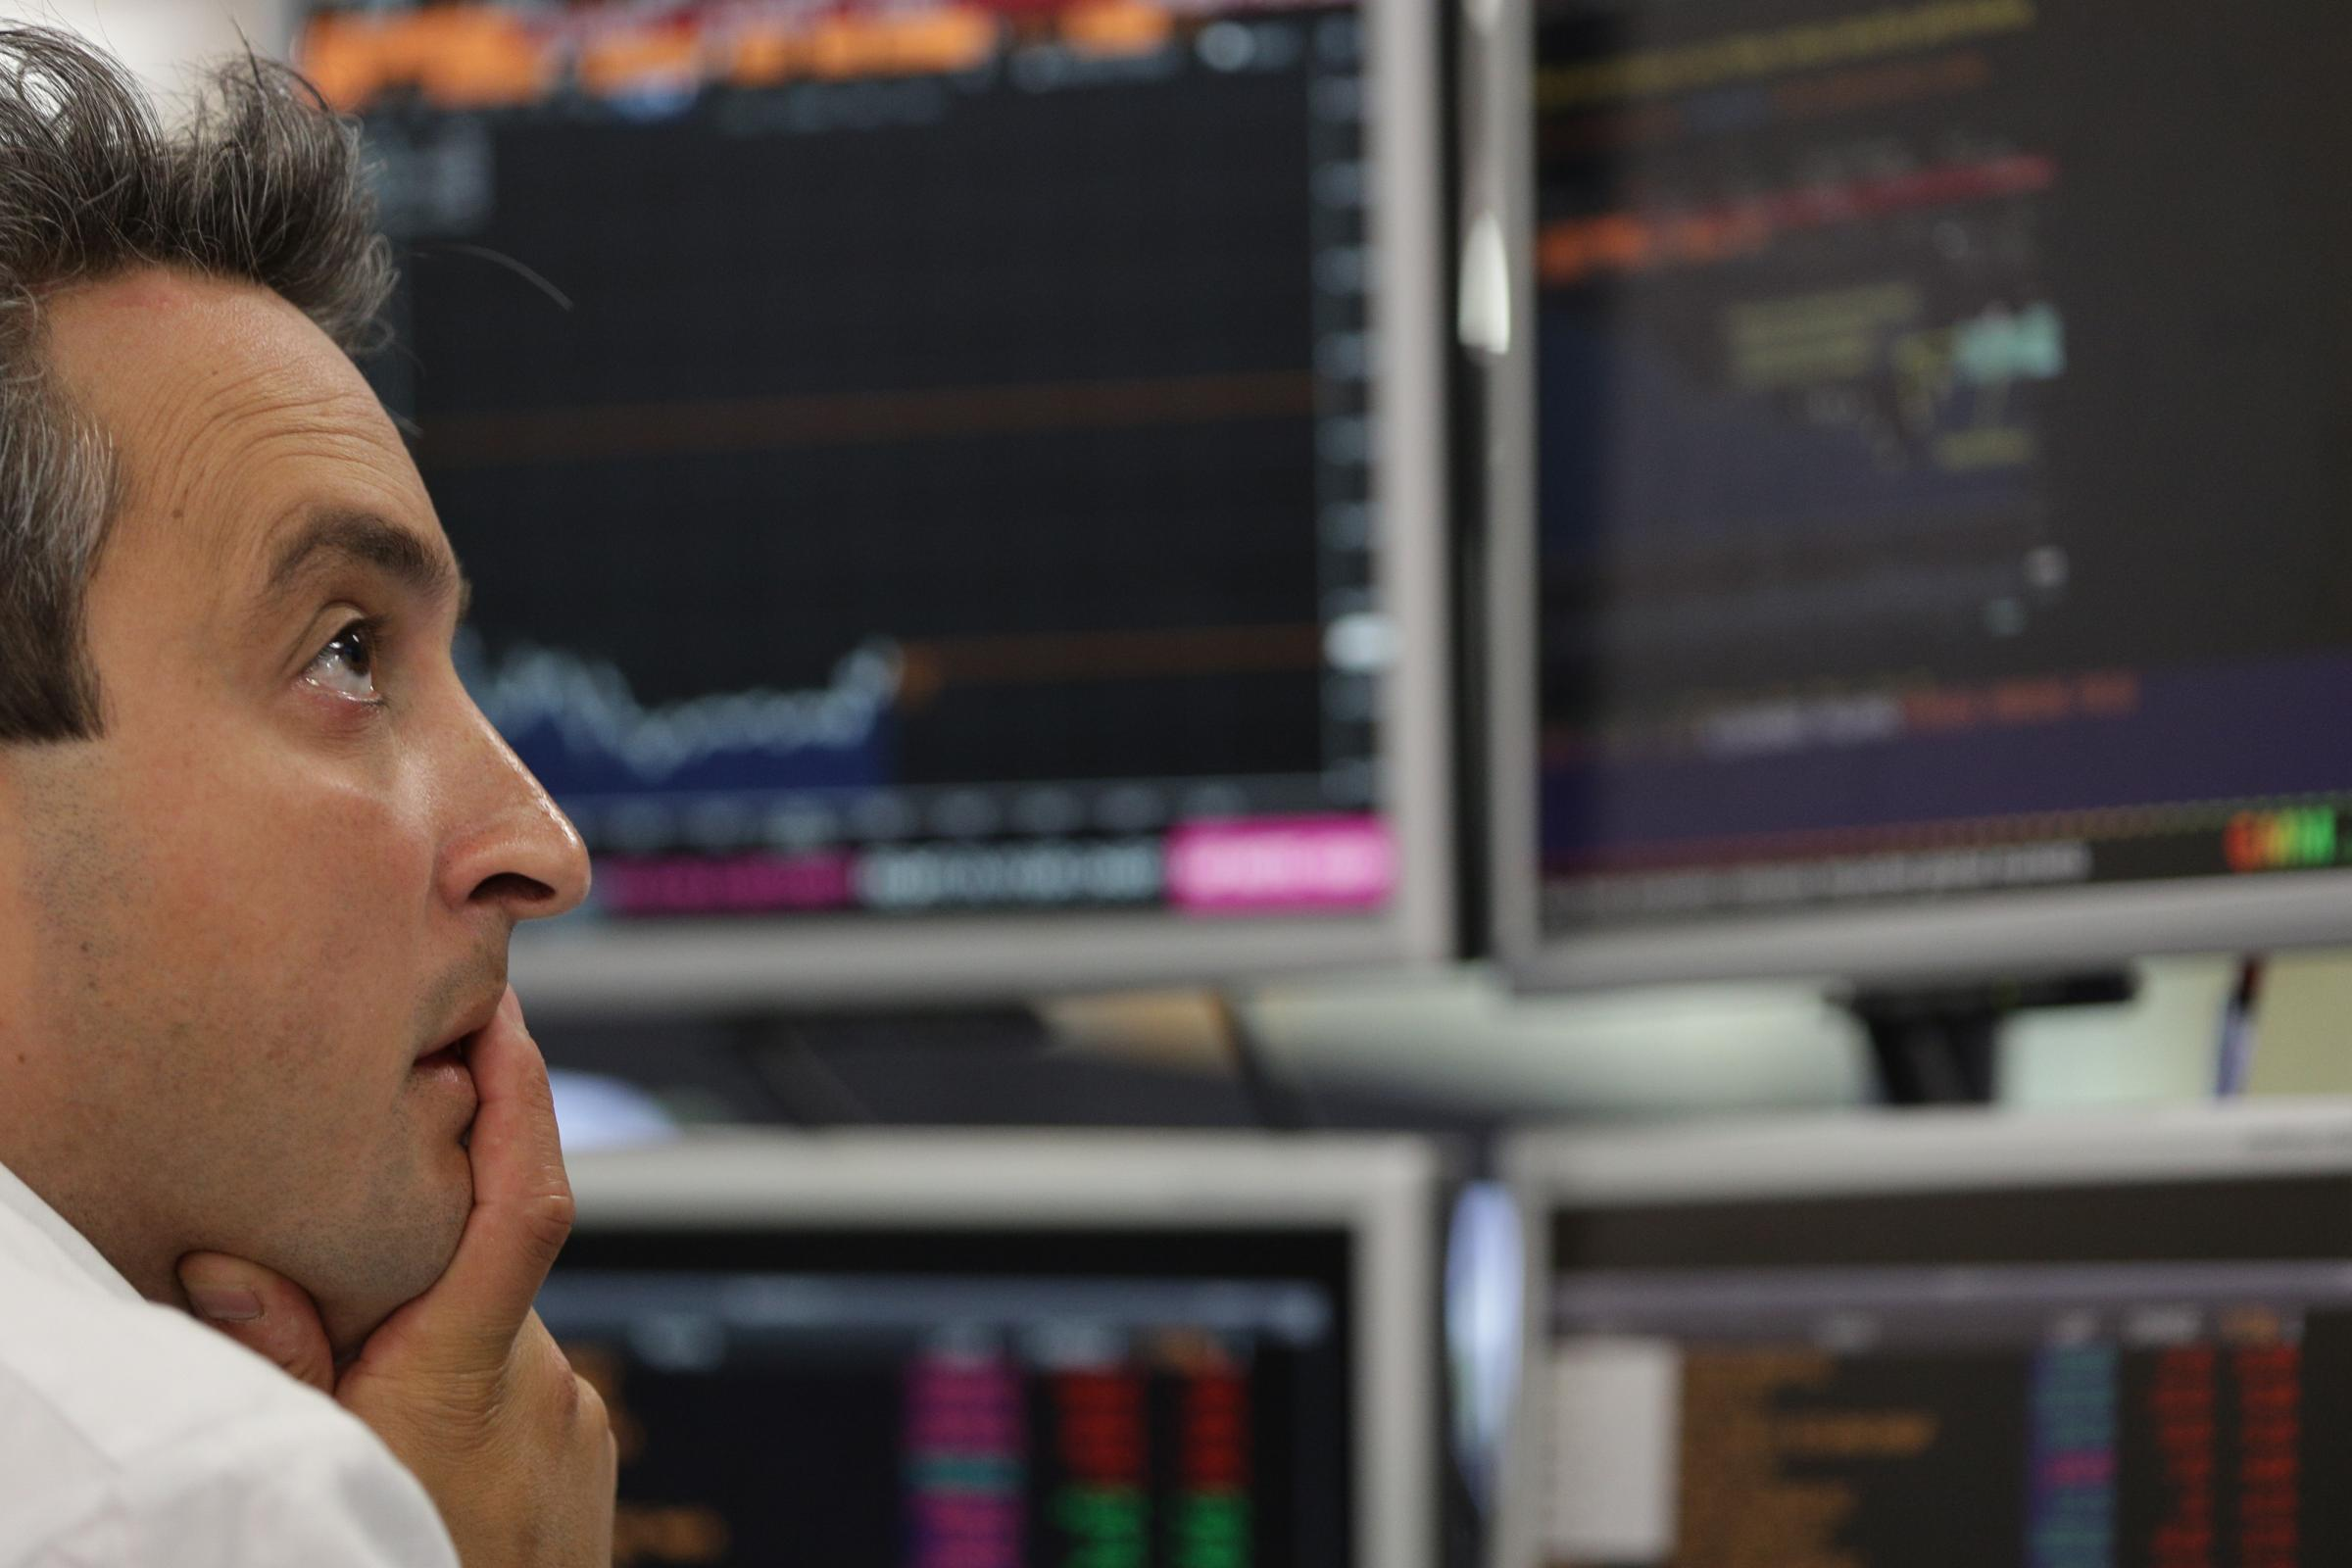 FTSE 100 turun di bawah 7.000 untuk pertama kalinya sejak Juli